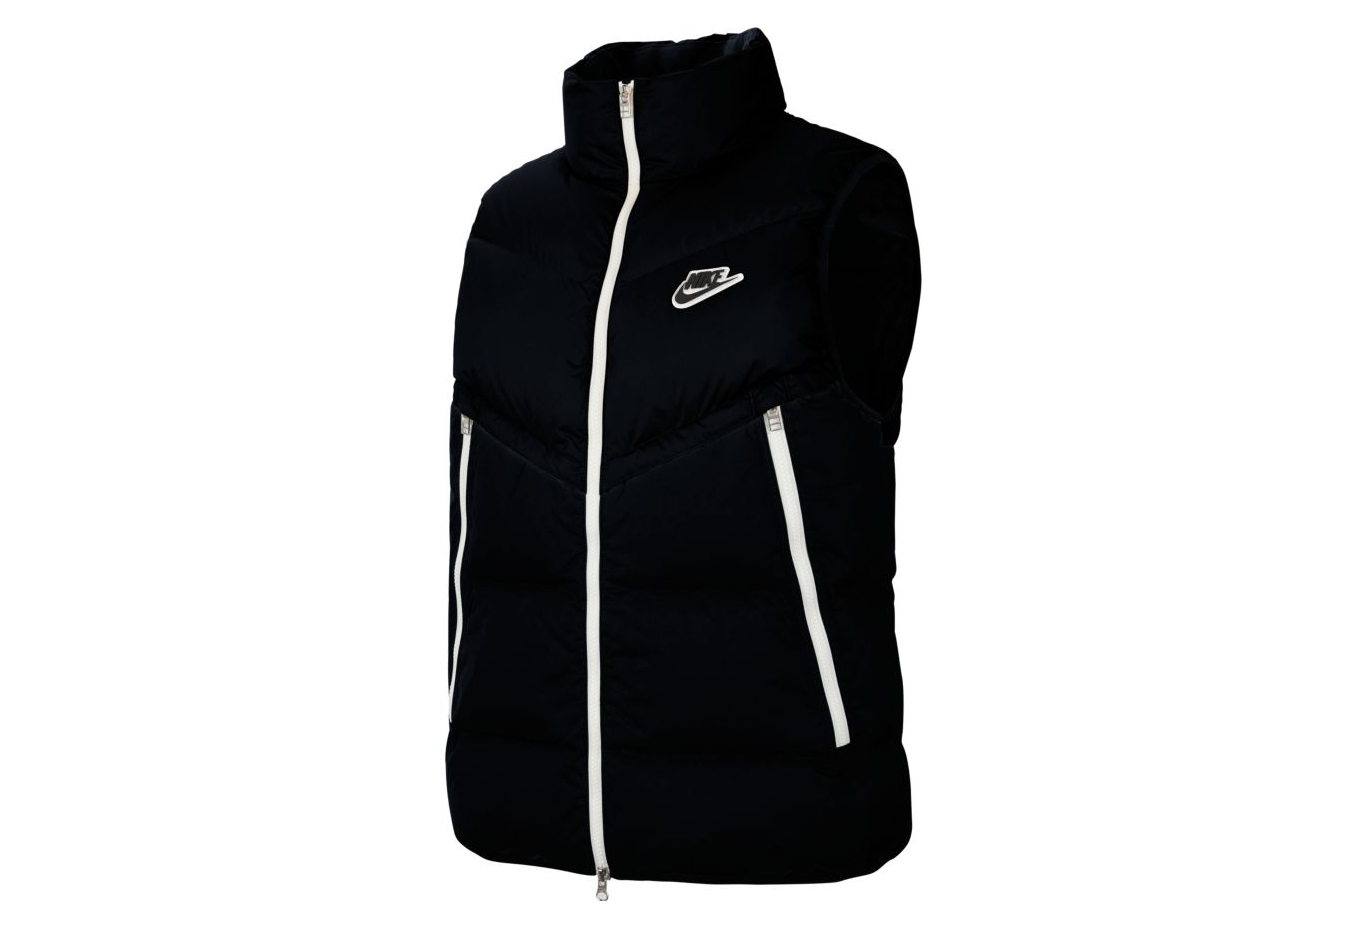 llamada respirar tienda de comestibles  Chaqueta sin mangas con relleno de plumón Windrunner Shield de Nike  Sportswear   Alltricks.es